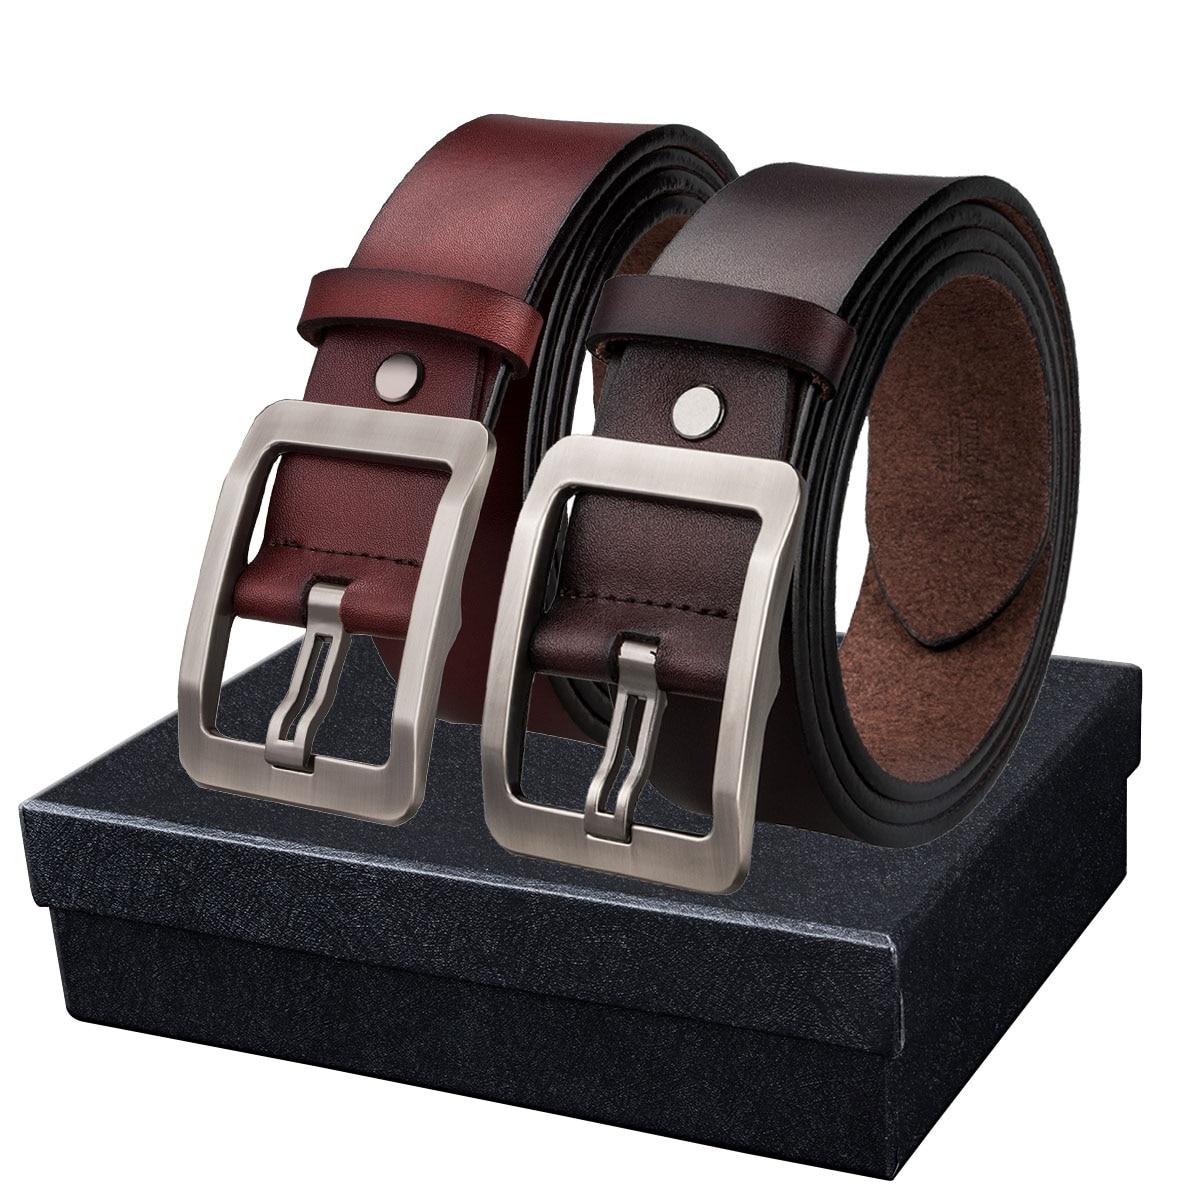 Anti-allergy Belt For Men Pin Buckle Belt Genuine Leather Belts Male Retro Waist Strap Puncher Gift Box Belt Jeans Barry.Wang